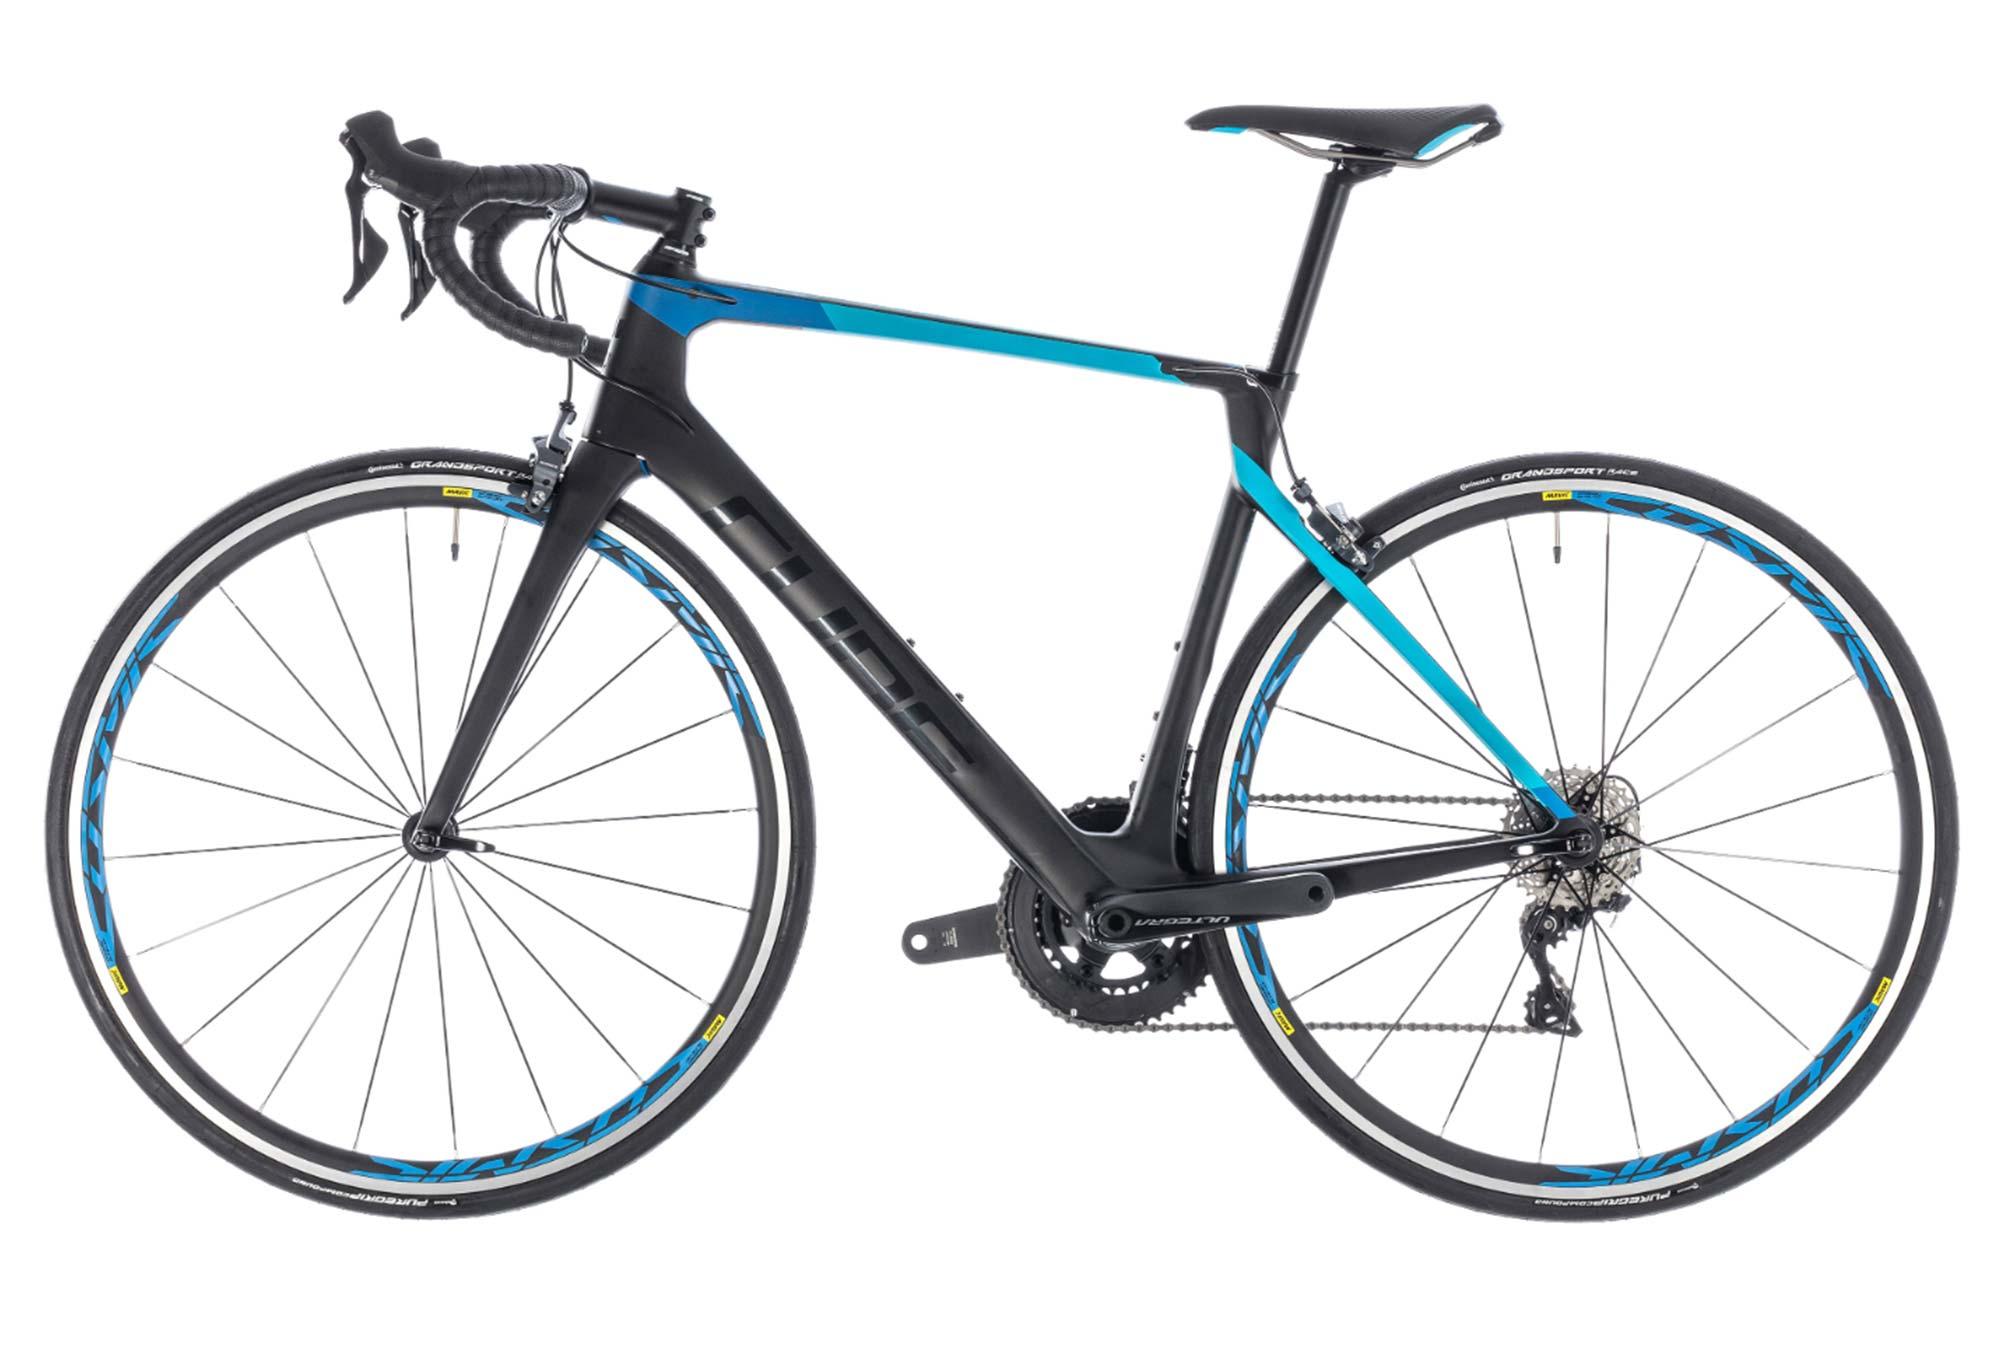 7d59feba37807b Vélo de Route Cube Agree C 62 Pro Shimano Ultegra 11V Noir   Bleu 2018